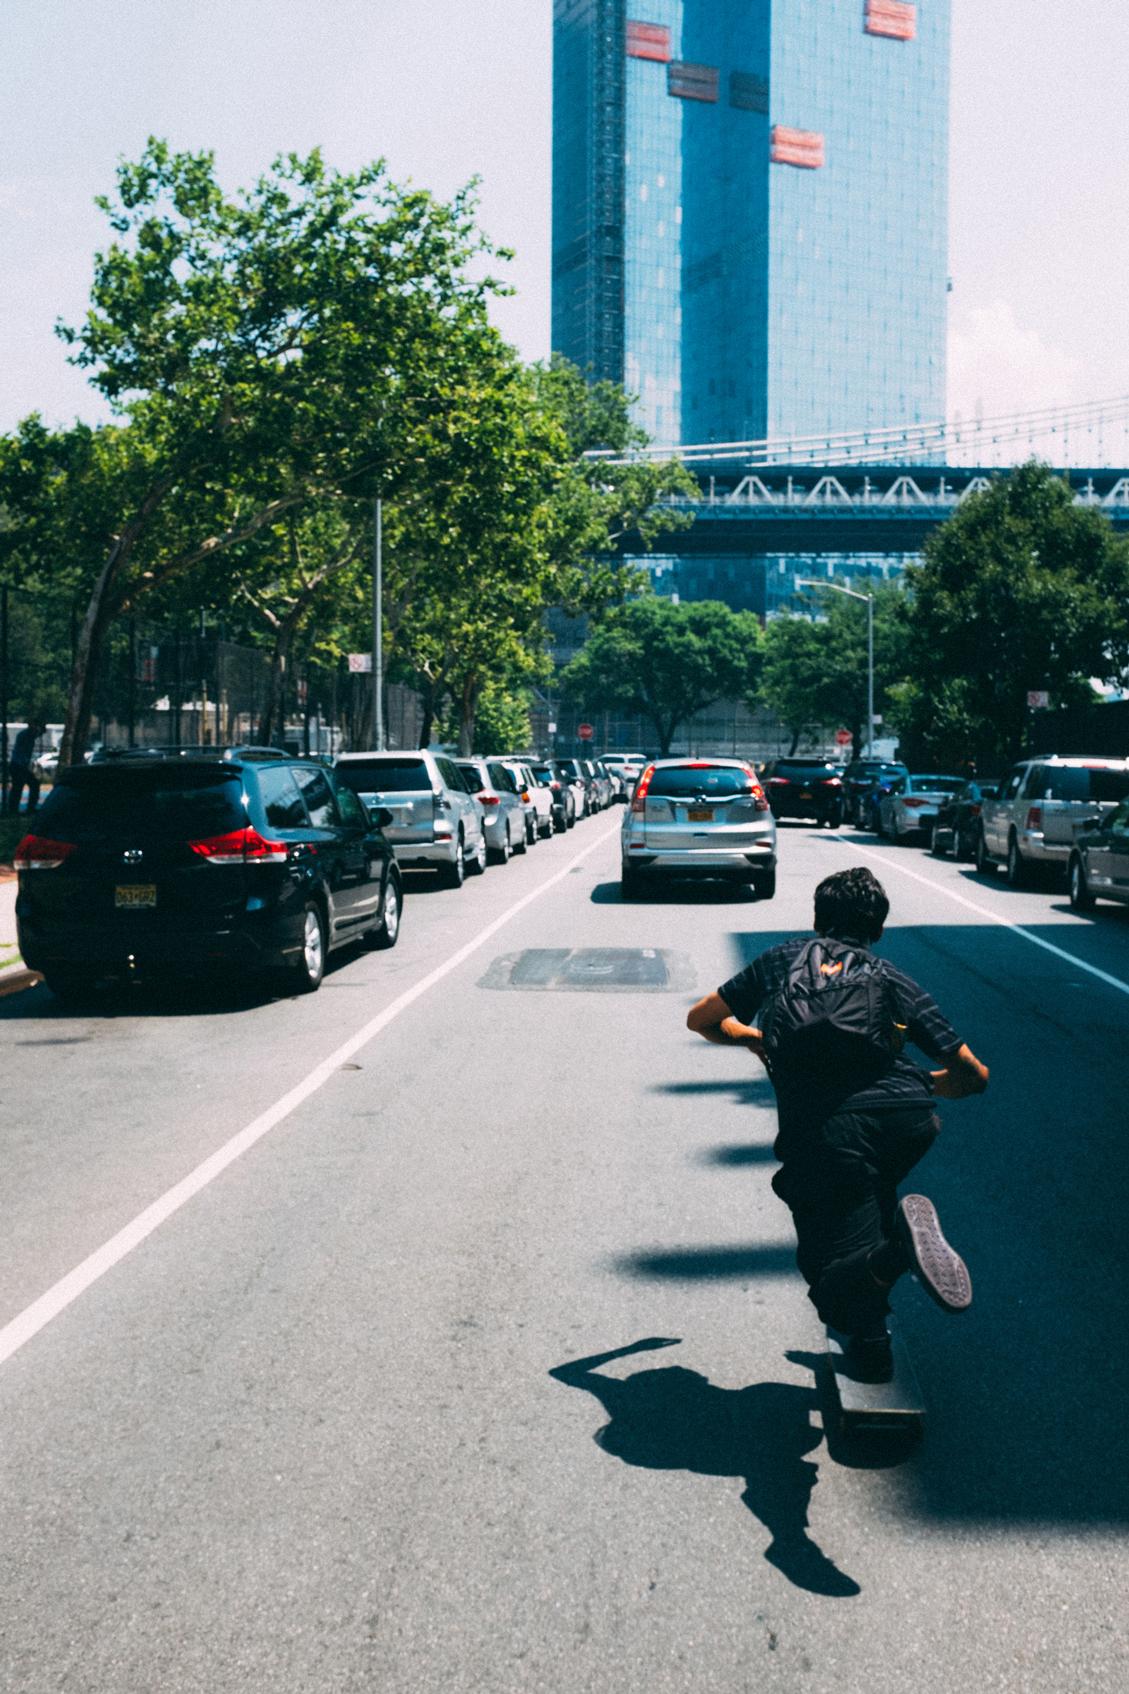 highGLOBElifestyle_NYC_photoPAPKE-1.jpg